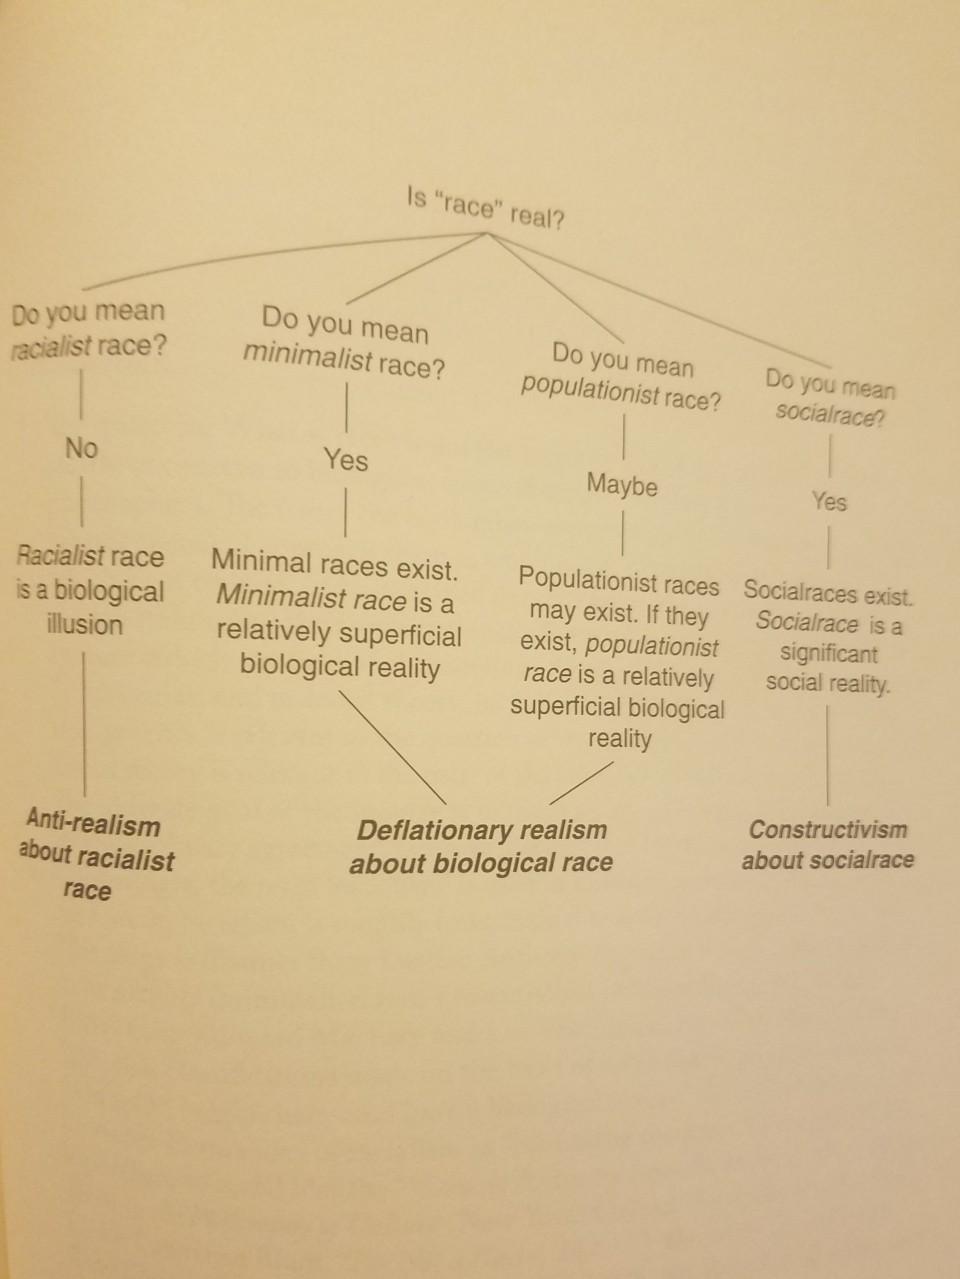 hardimon flow chart